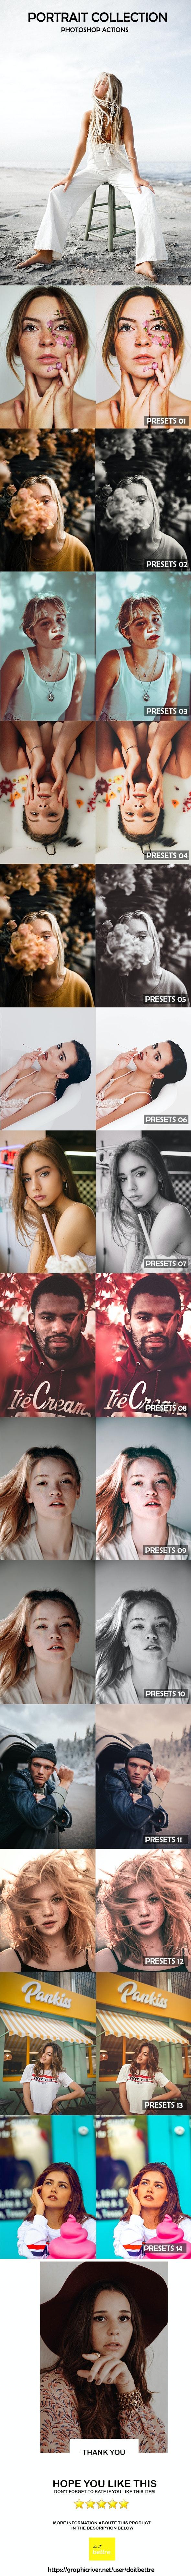 Pro Portrait Photoshop Actions - Photoshop Add-ons